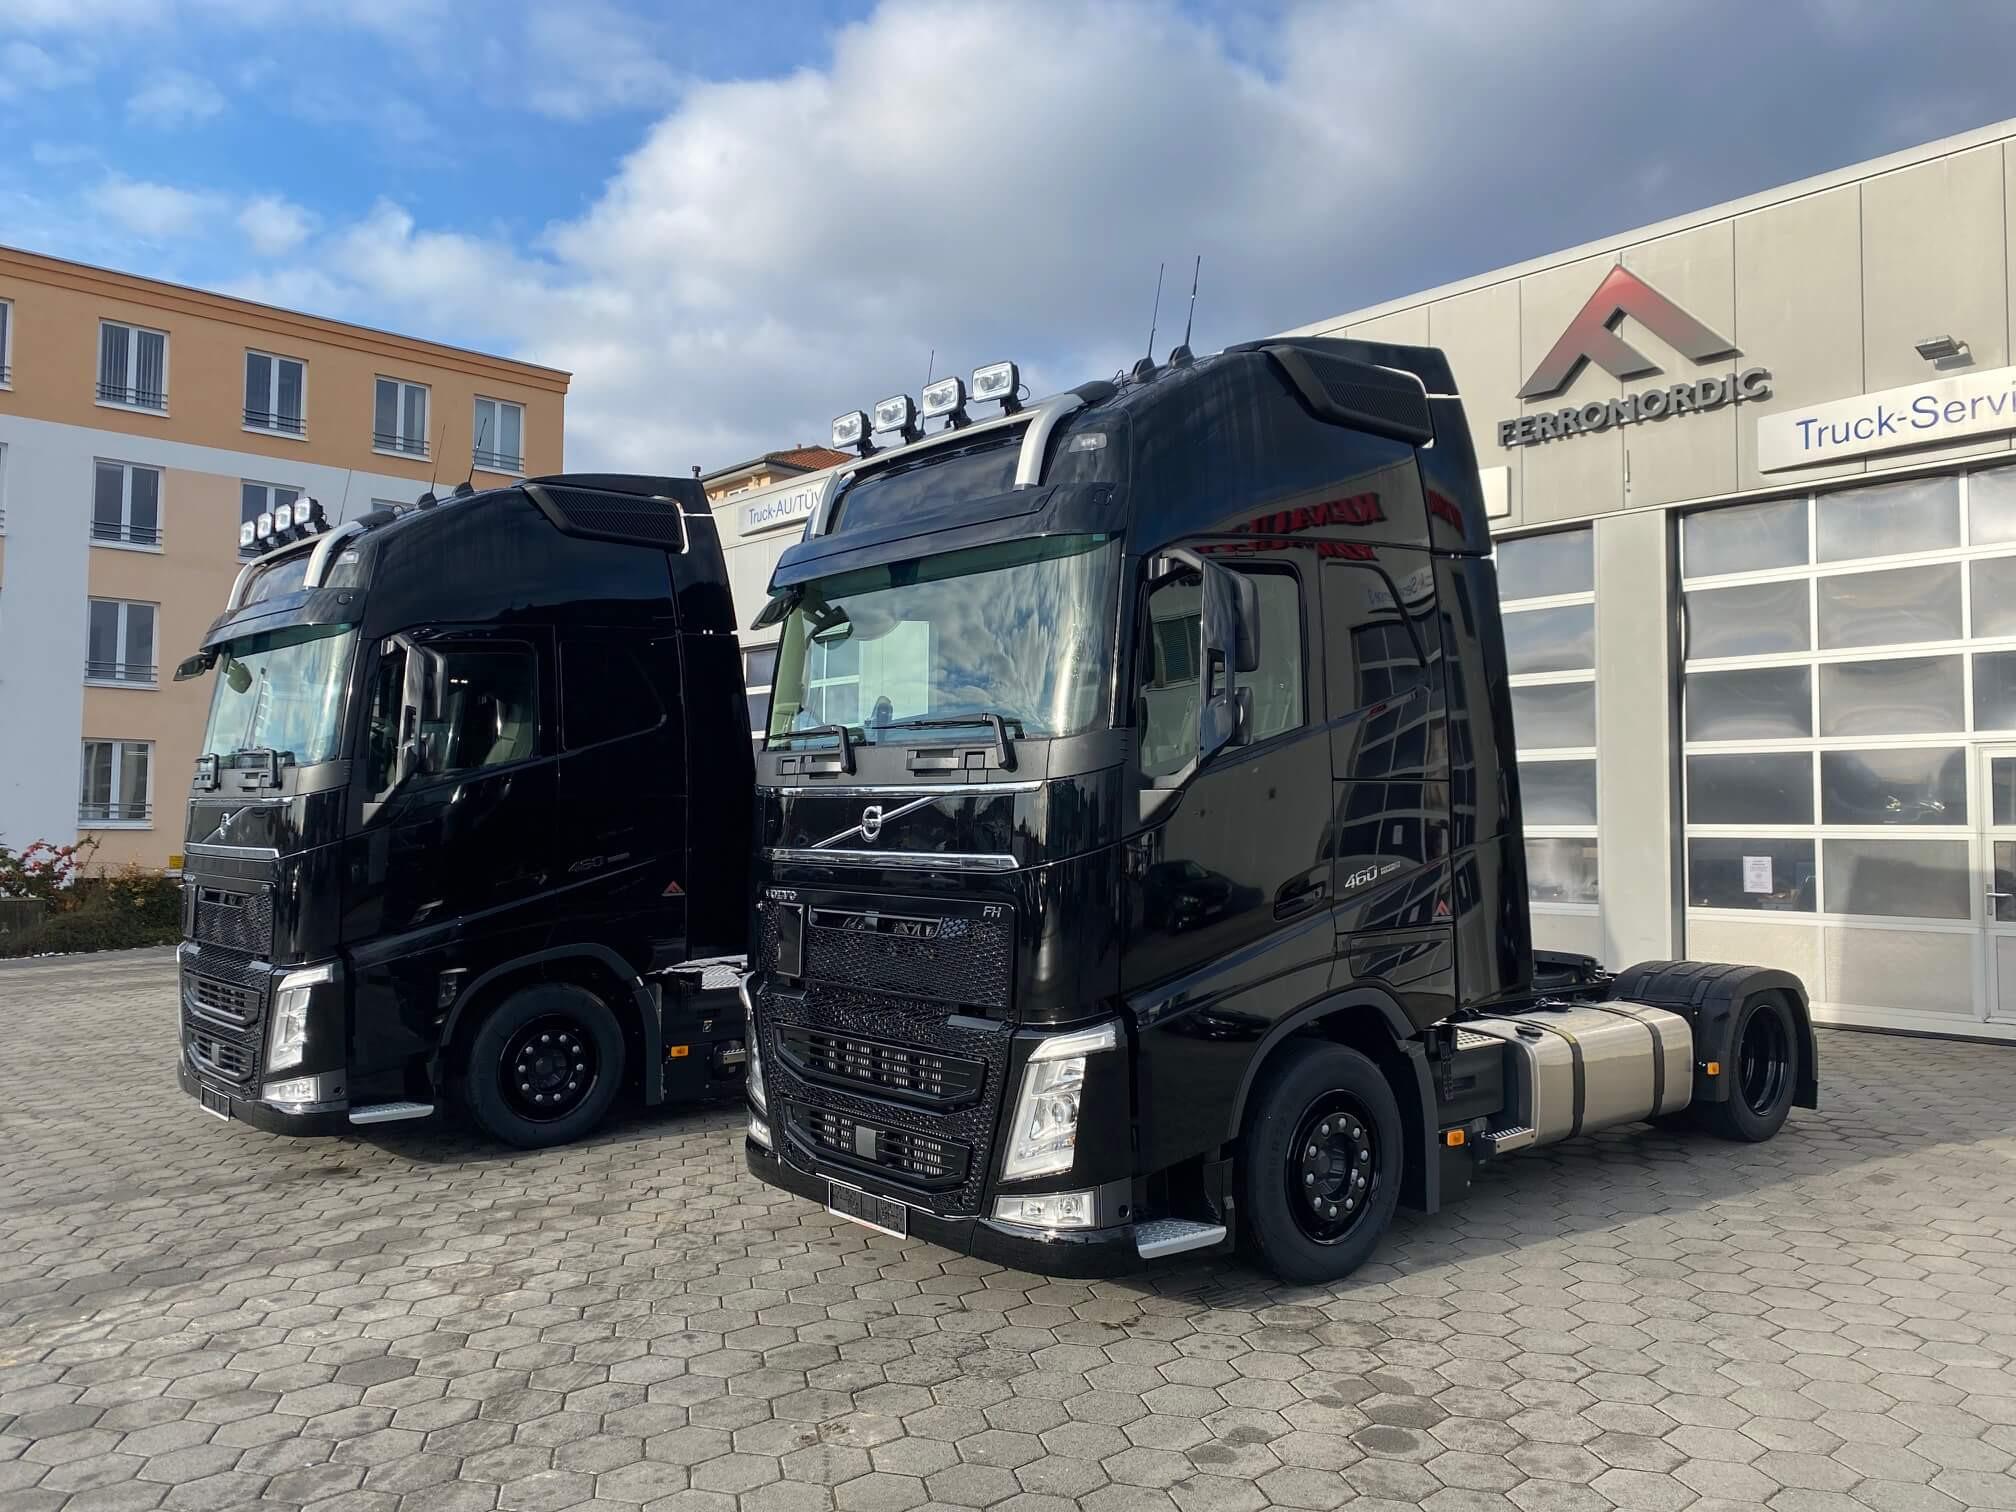 Volvo FH460 4x2 X-LOW geliefert an Firma TransLine 24 GmbH aus Kelsterbach.